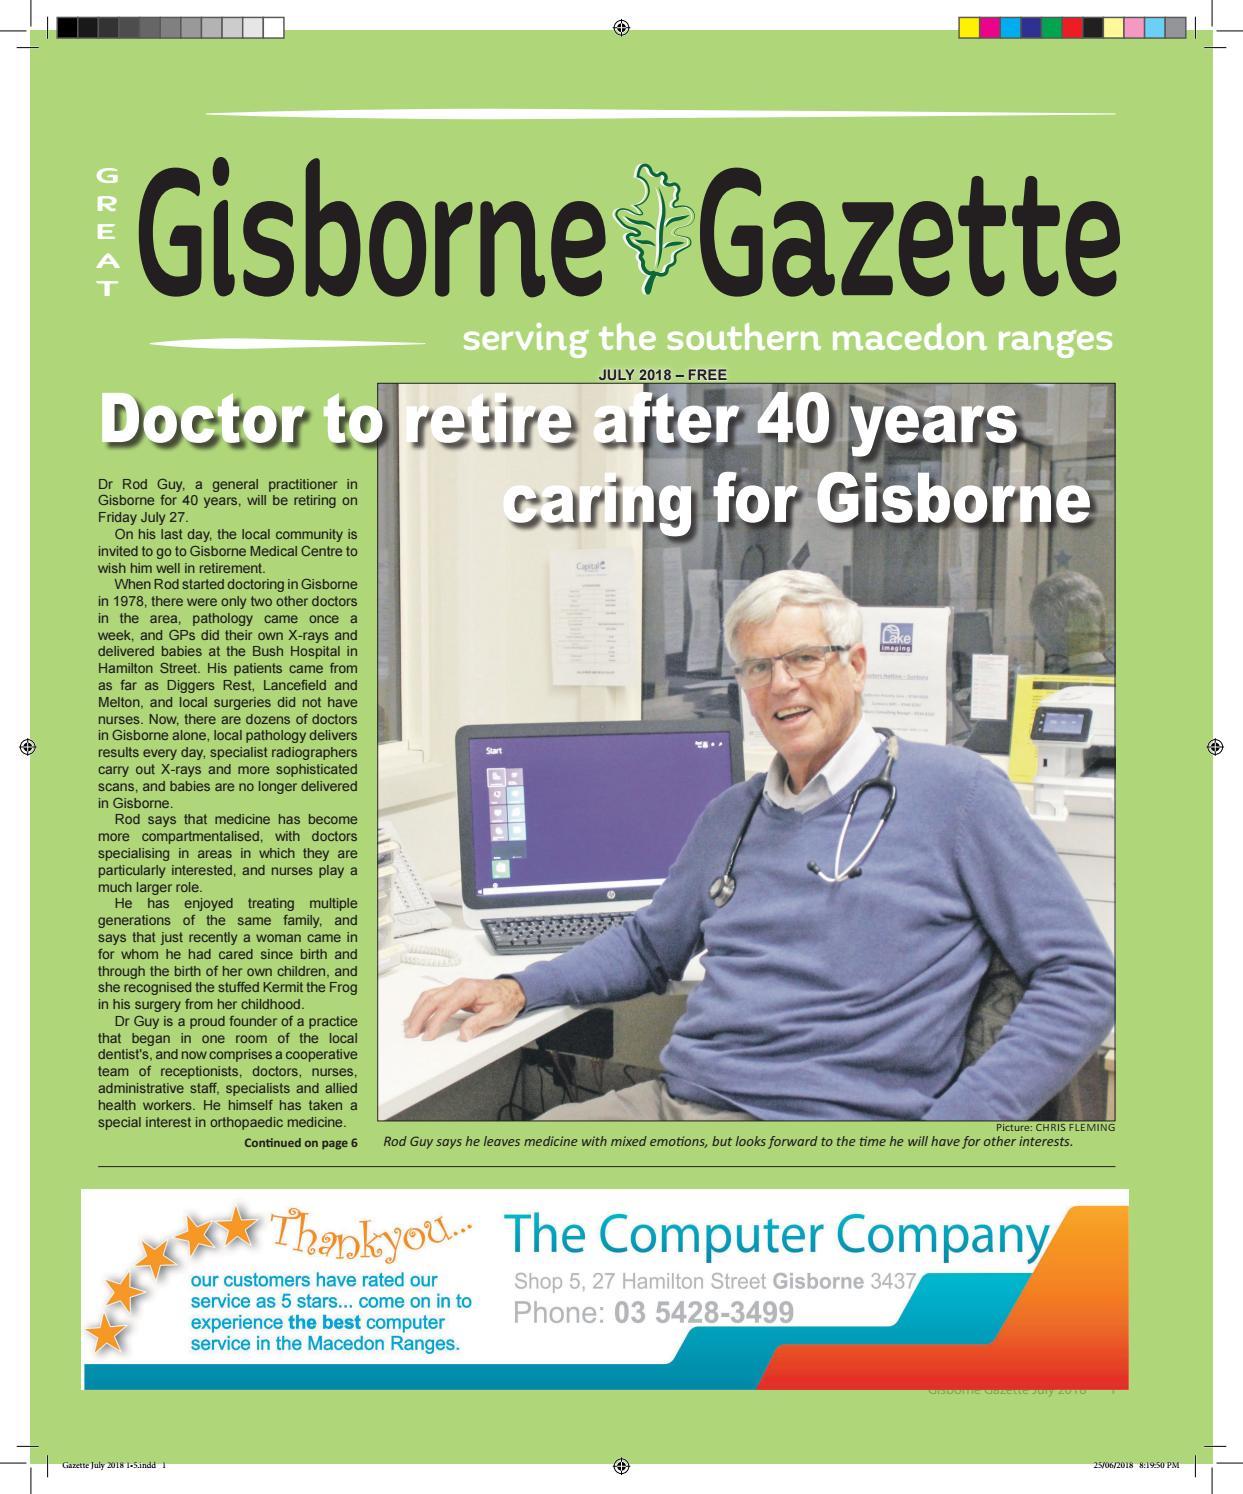 Gisborne Gazette July 2018 By Gisborne Gazette Issuu